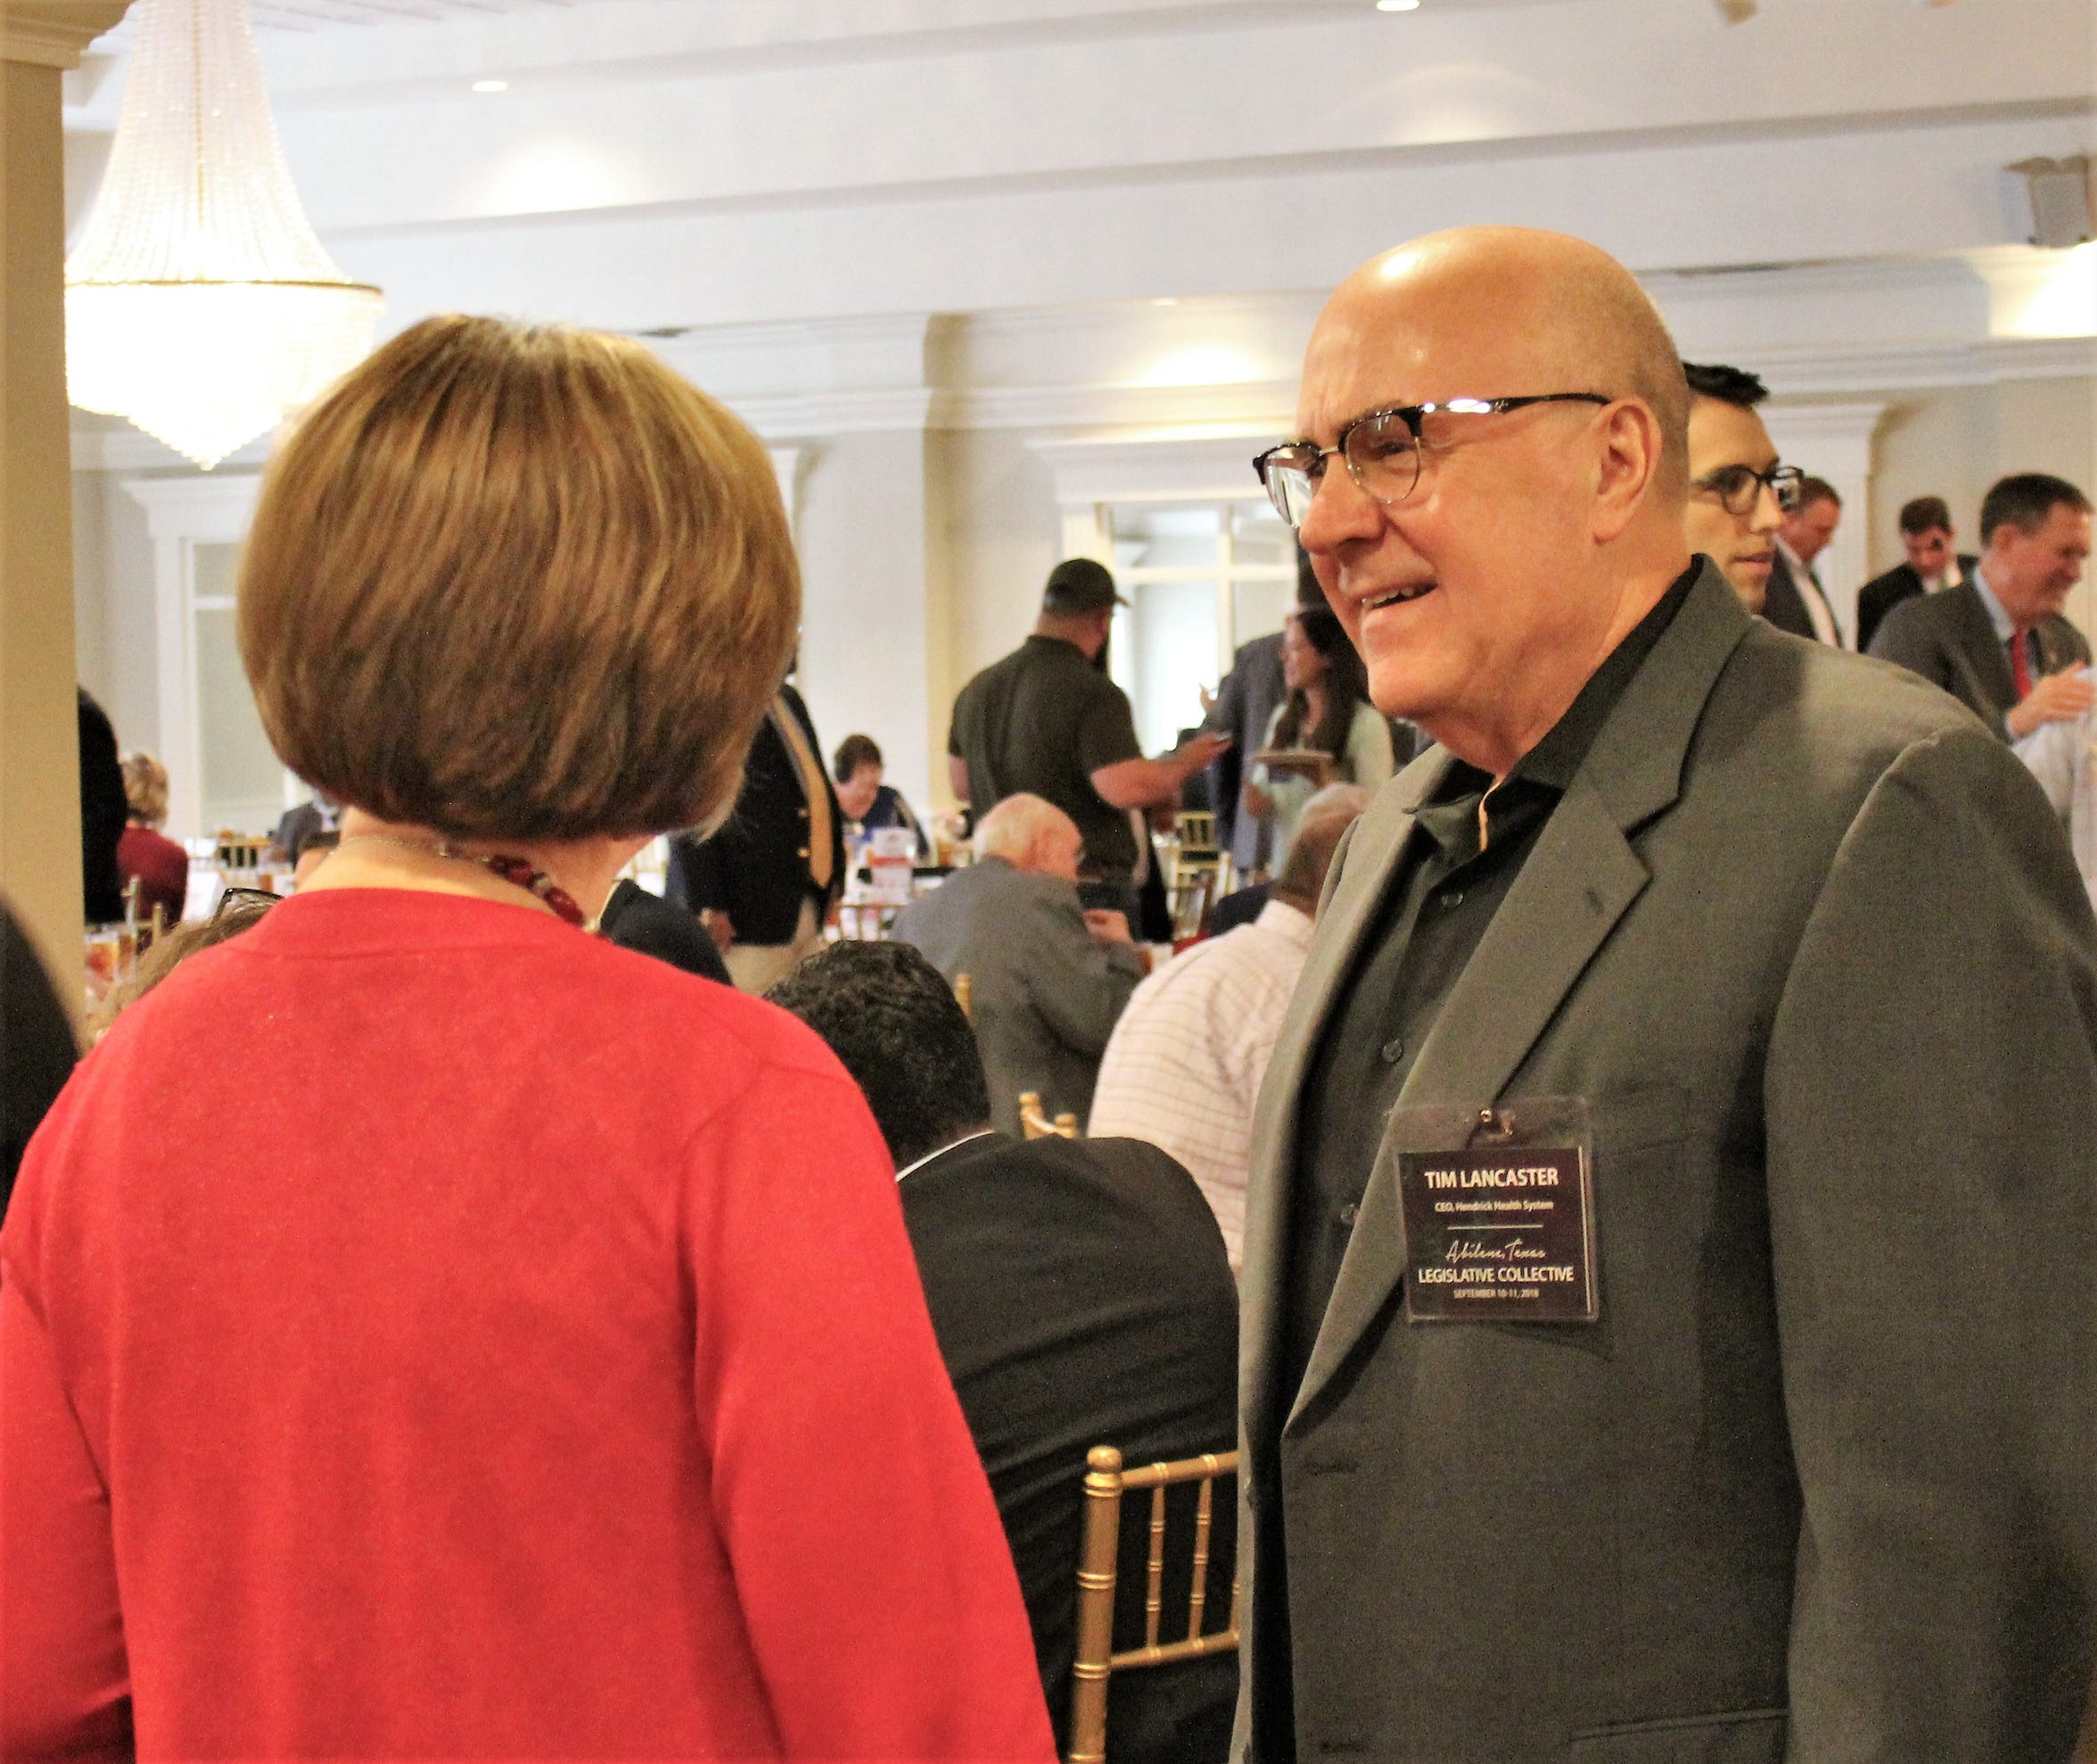 Tim Lancaster participated in the Abilene Chamber of Commerce's recent legislative summit.